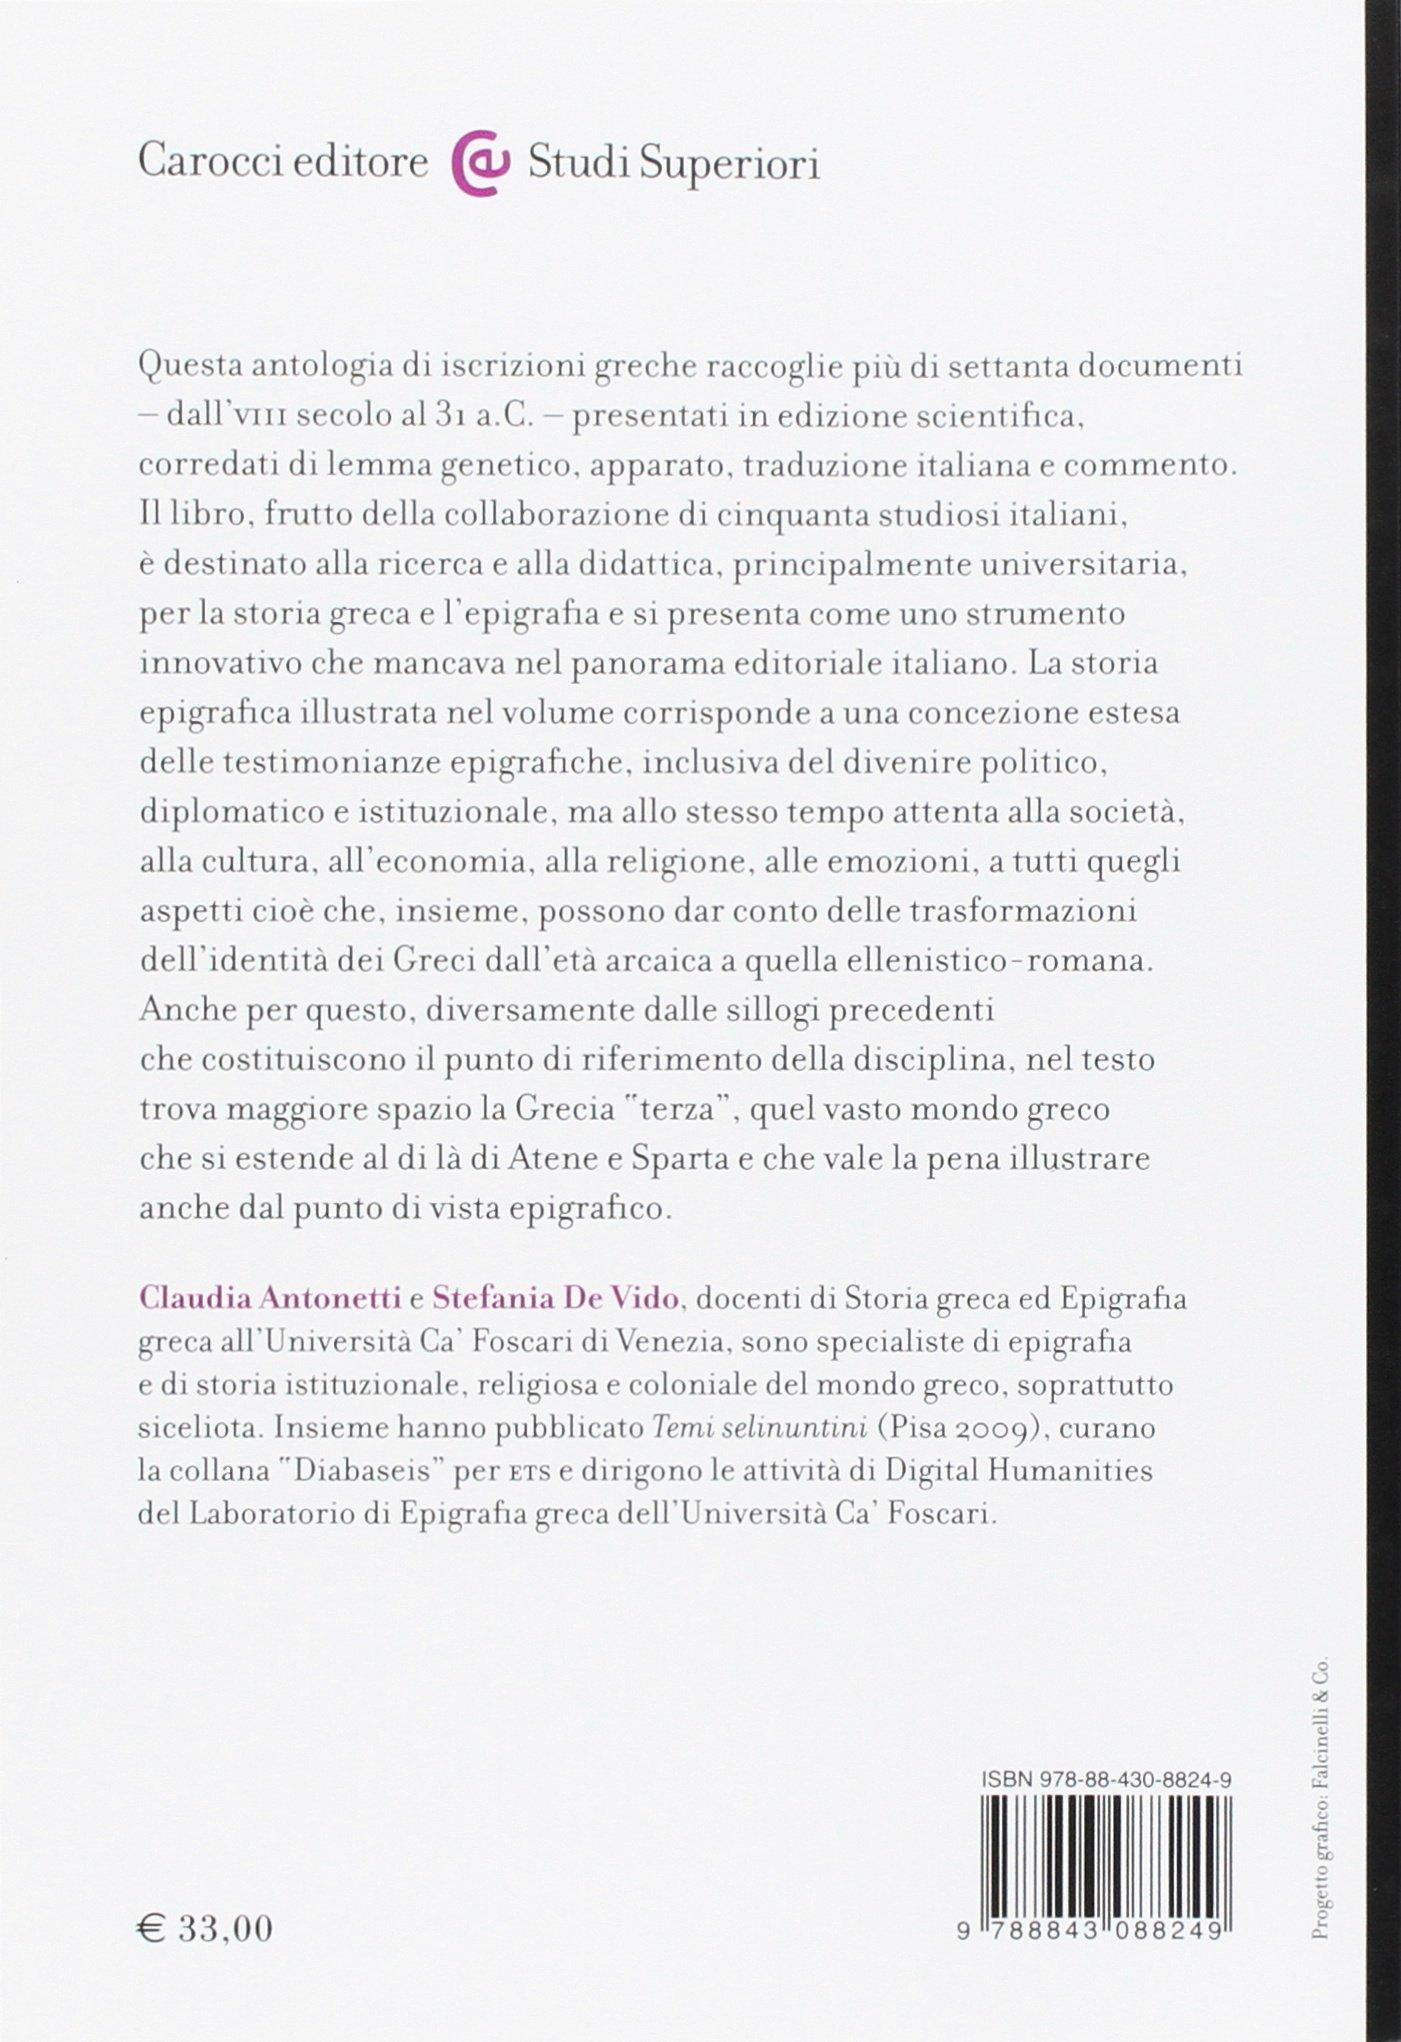 Iscrizioni greche. Unantologia (Studi superiori): Amazon.es: C. Antonetti, S. De Vido: Libros en idiomas extranjeros